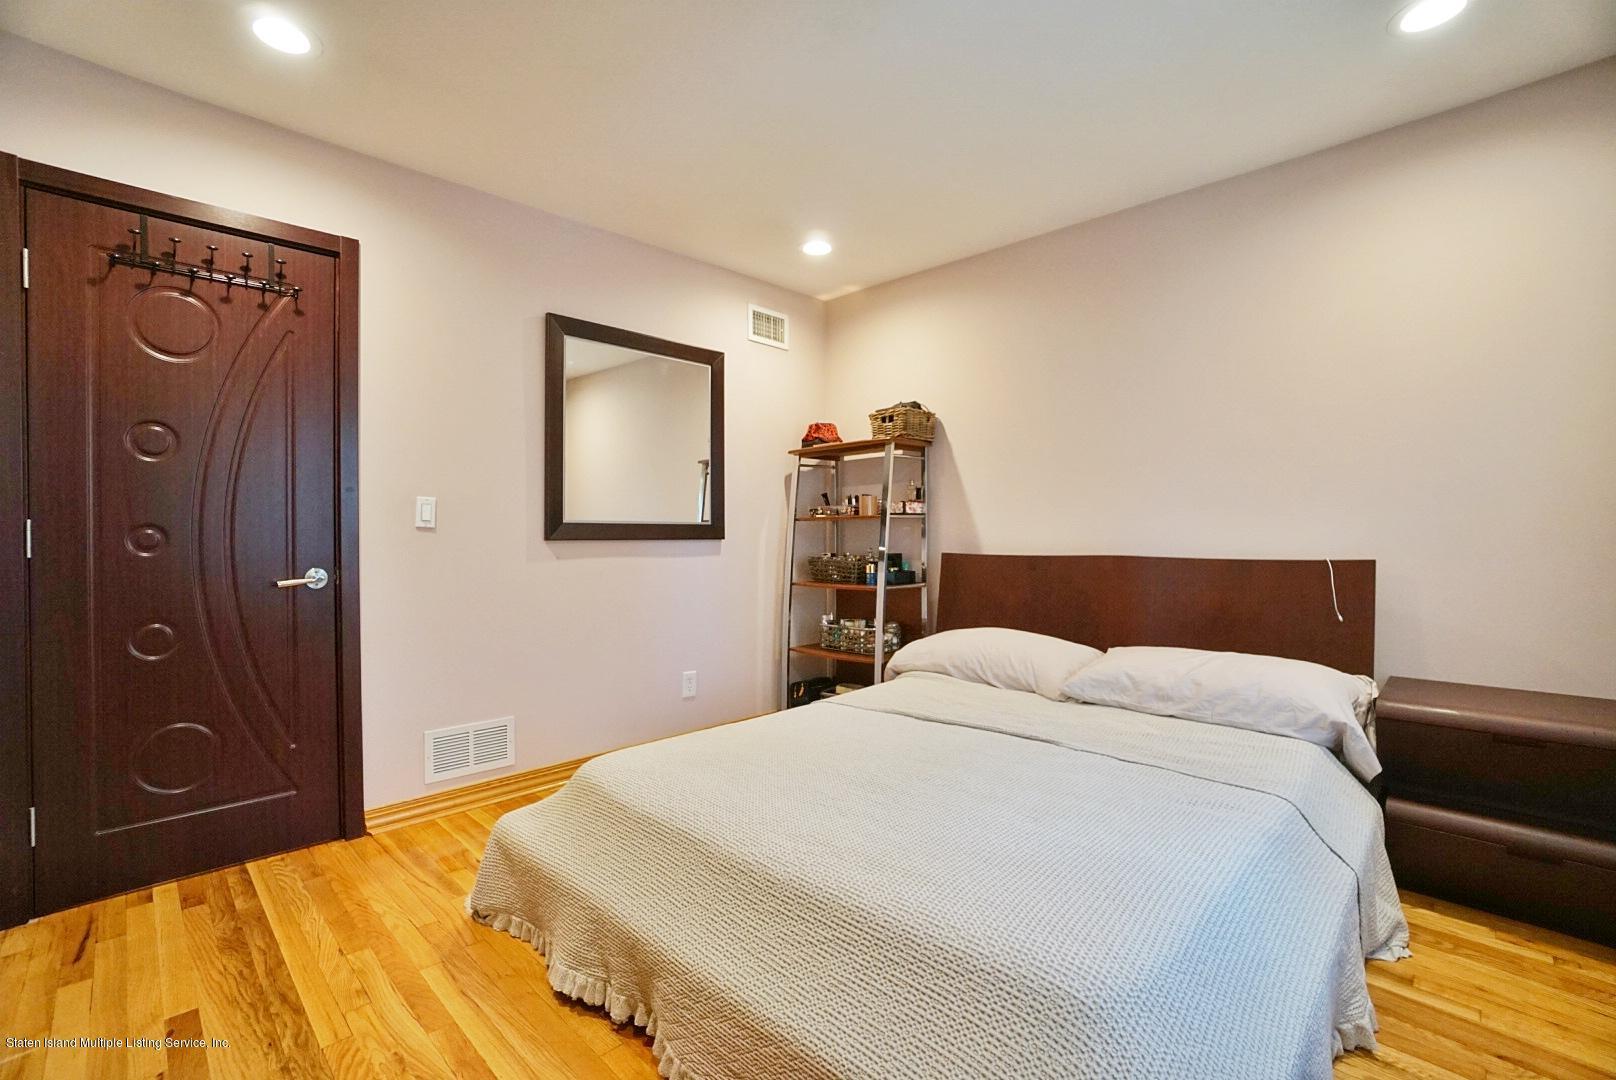 Single Family - Detached 48 Ocean Terrace  Staten Island, NY 10314, MLS-1130826-44